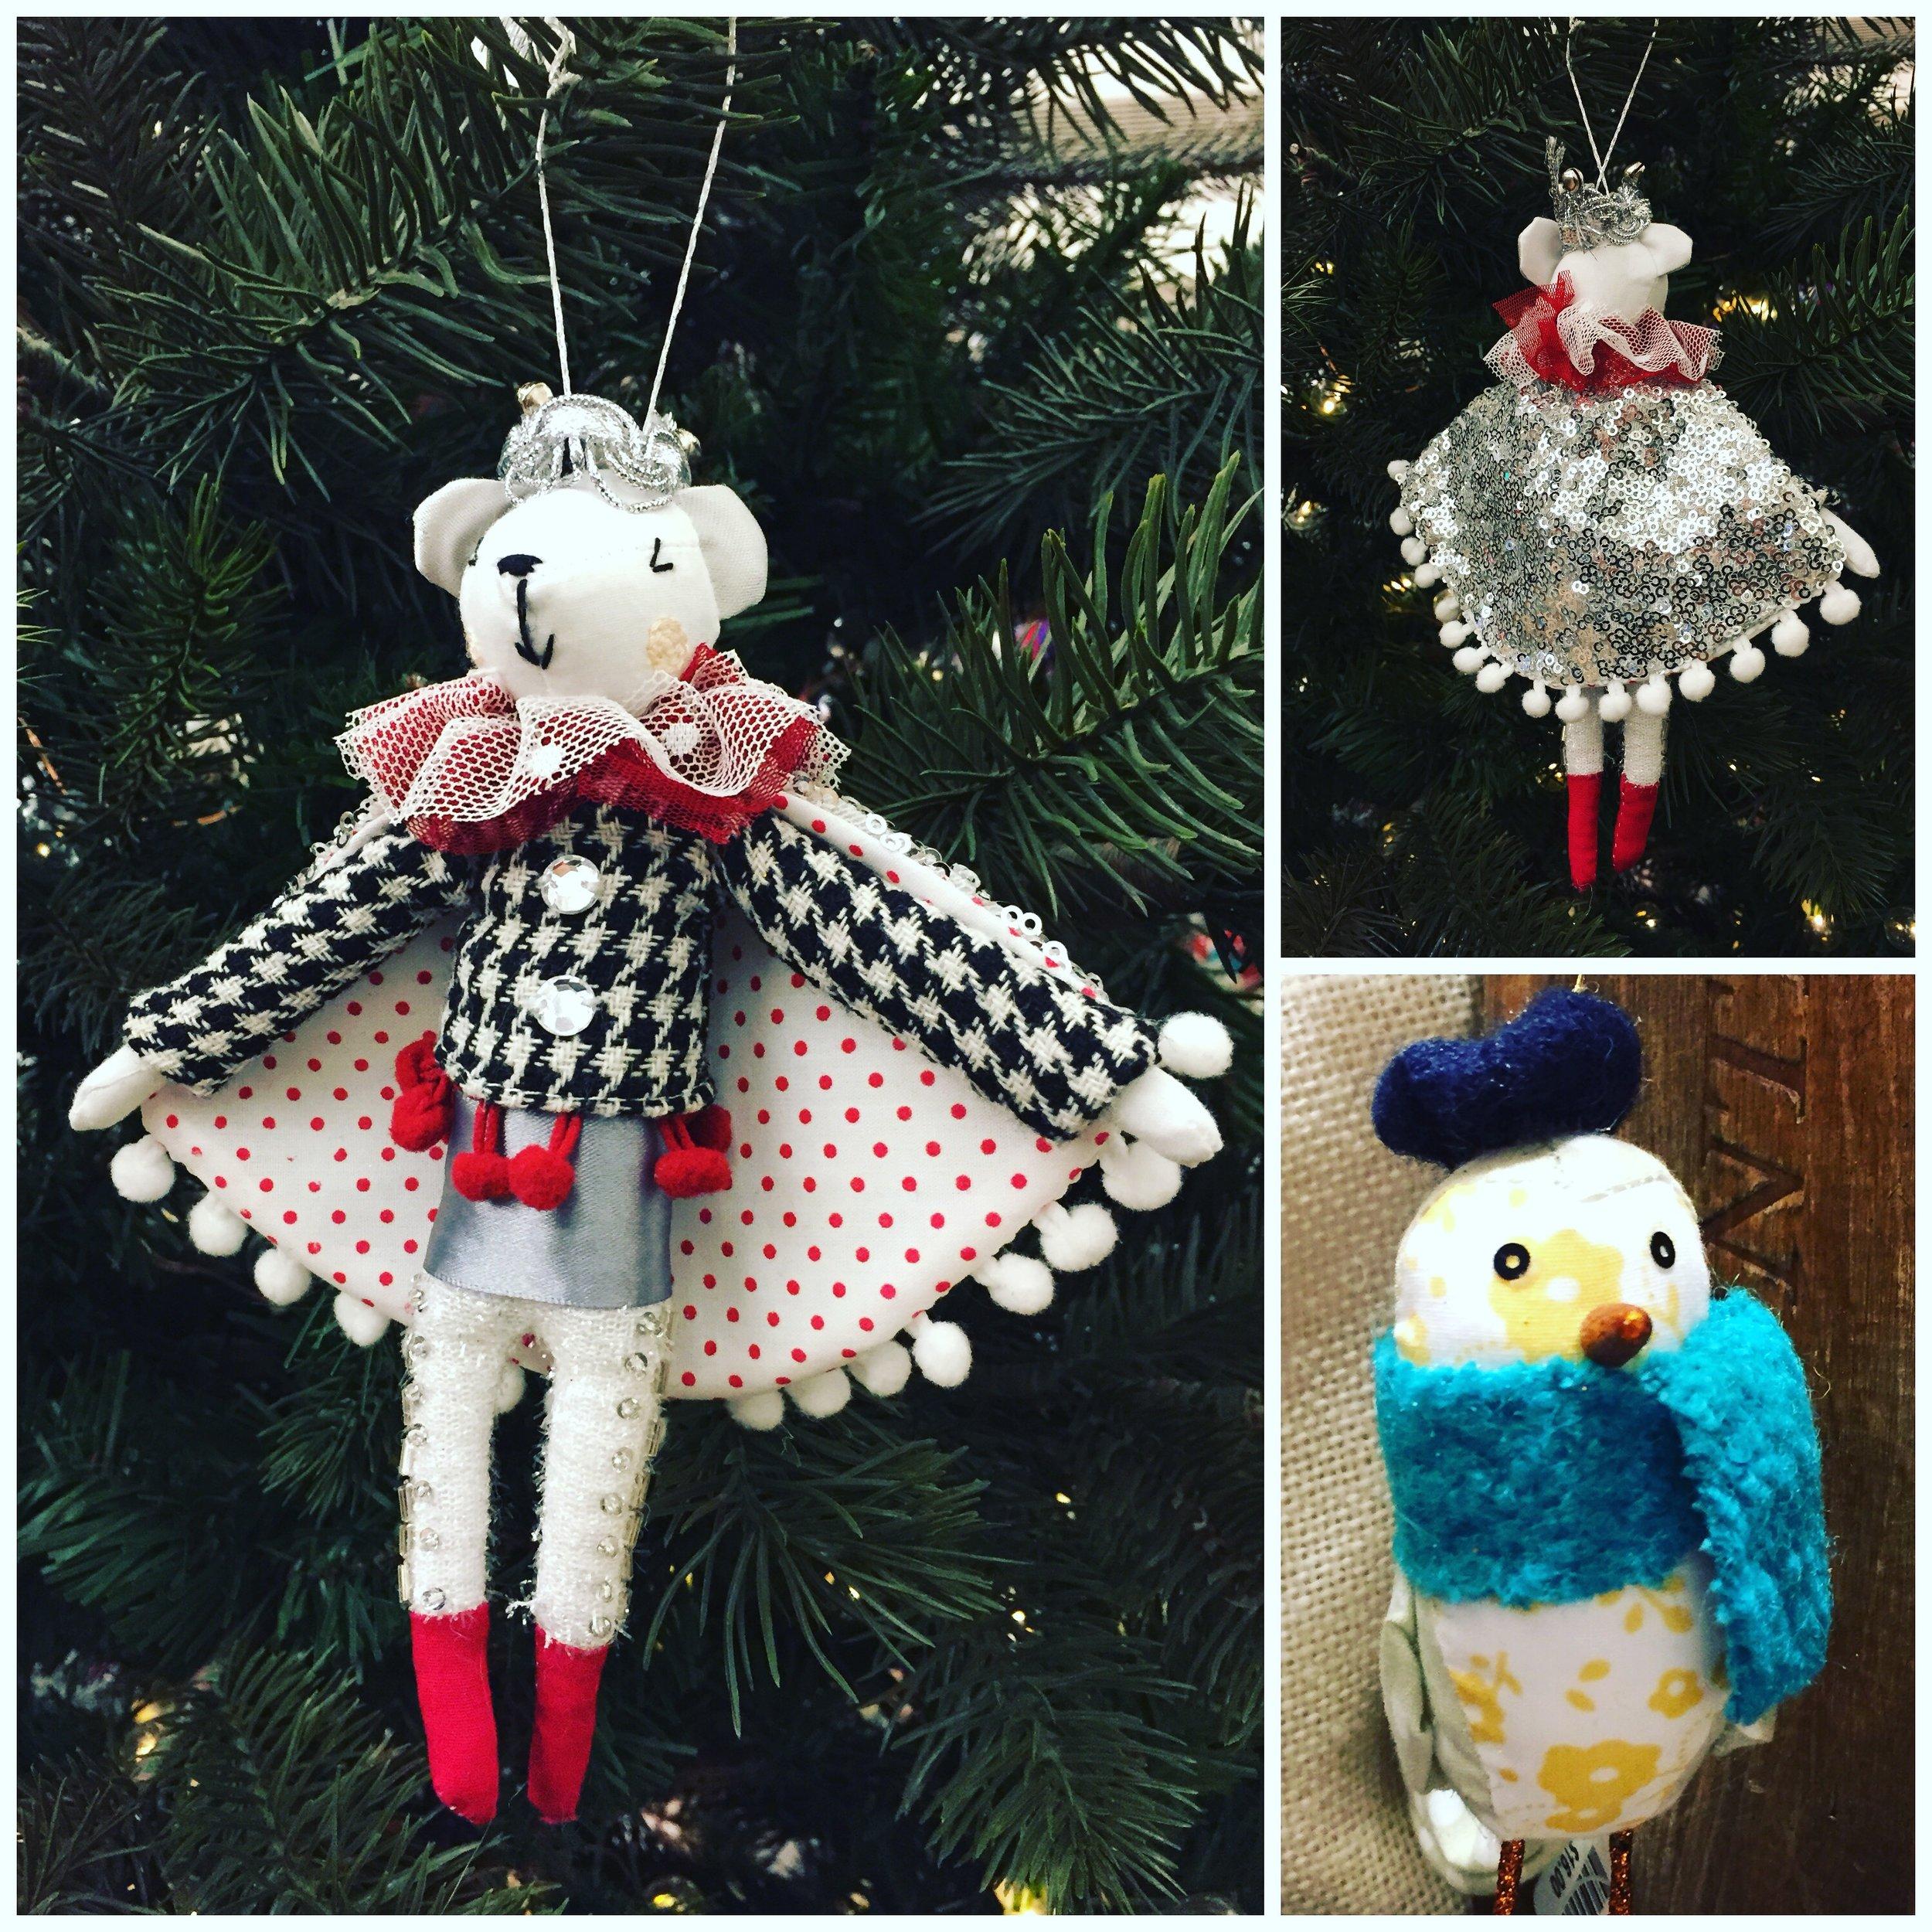 softiescuties_nutcracker_bird_ornament.JPG